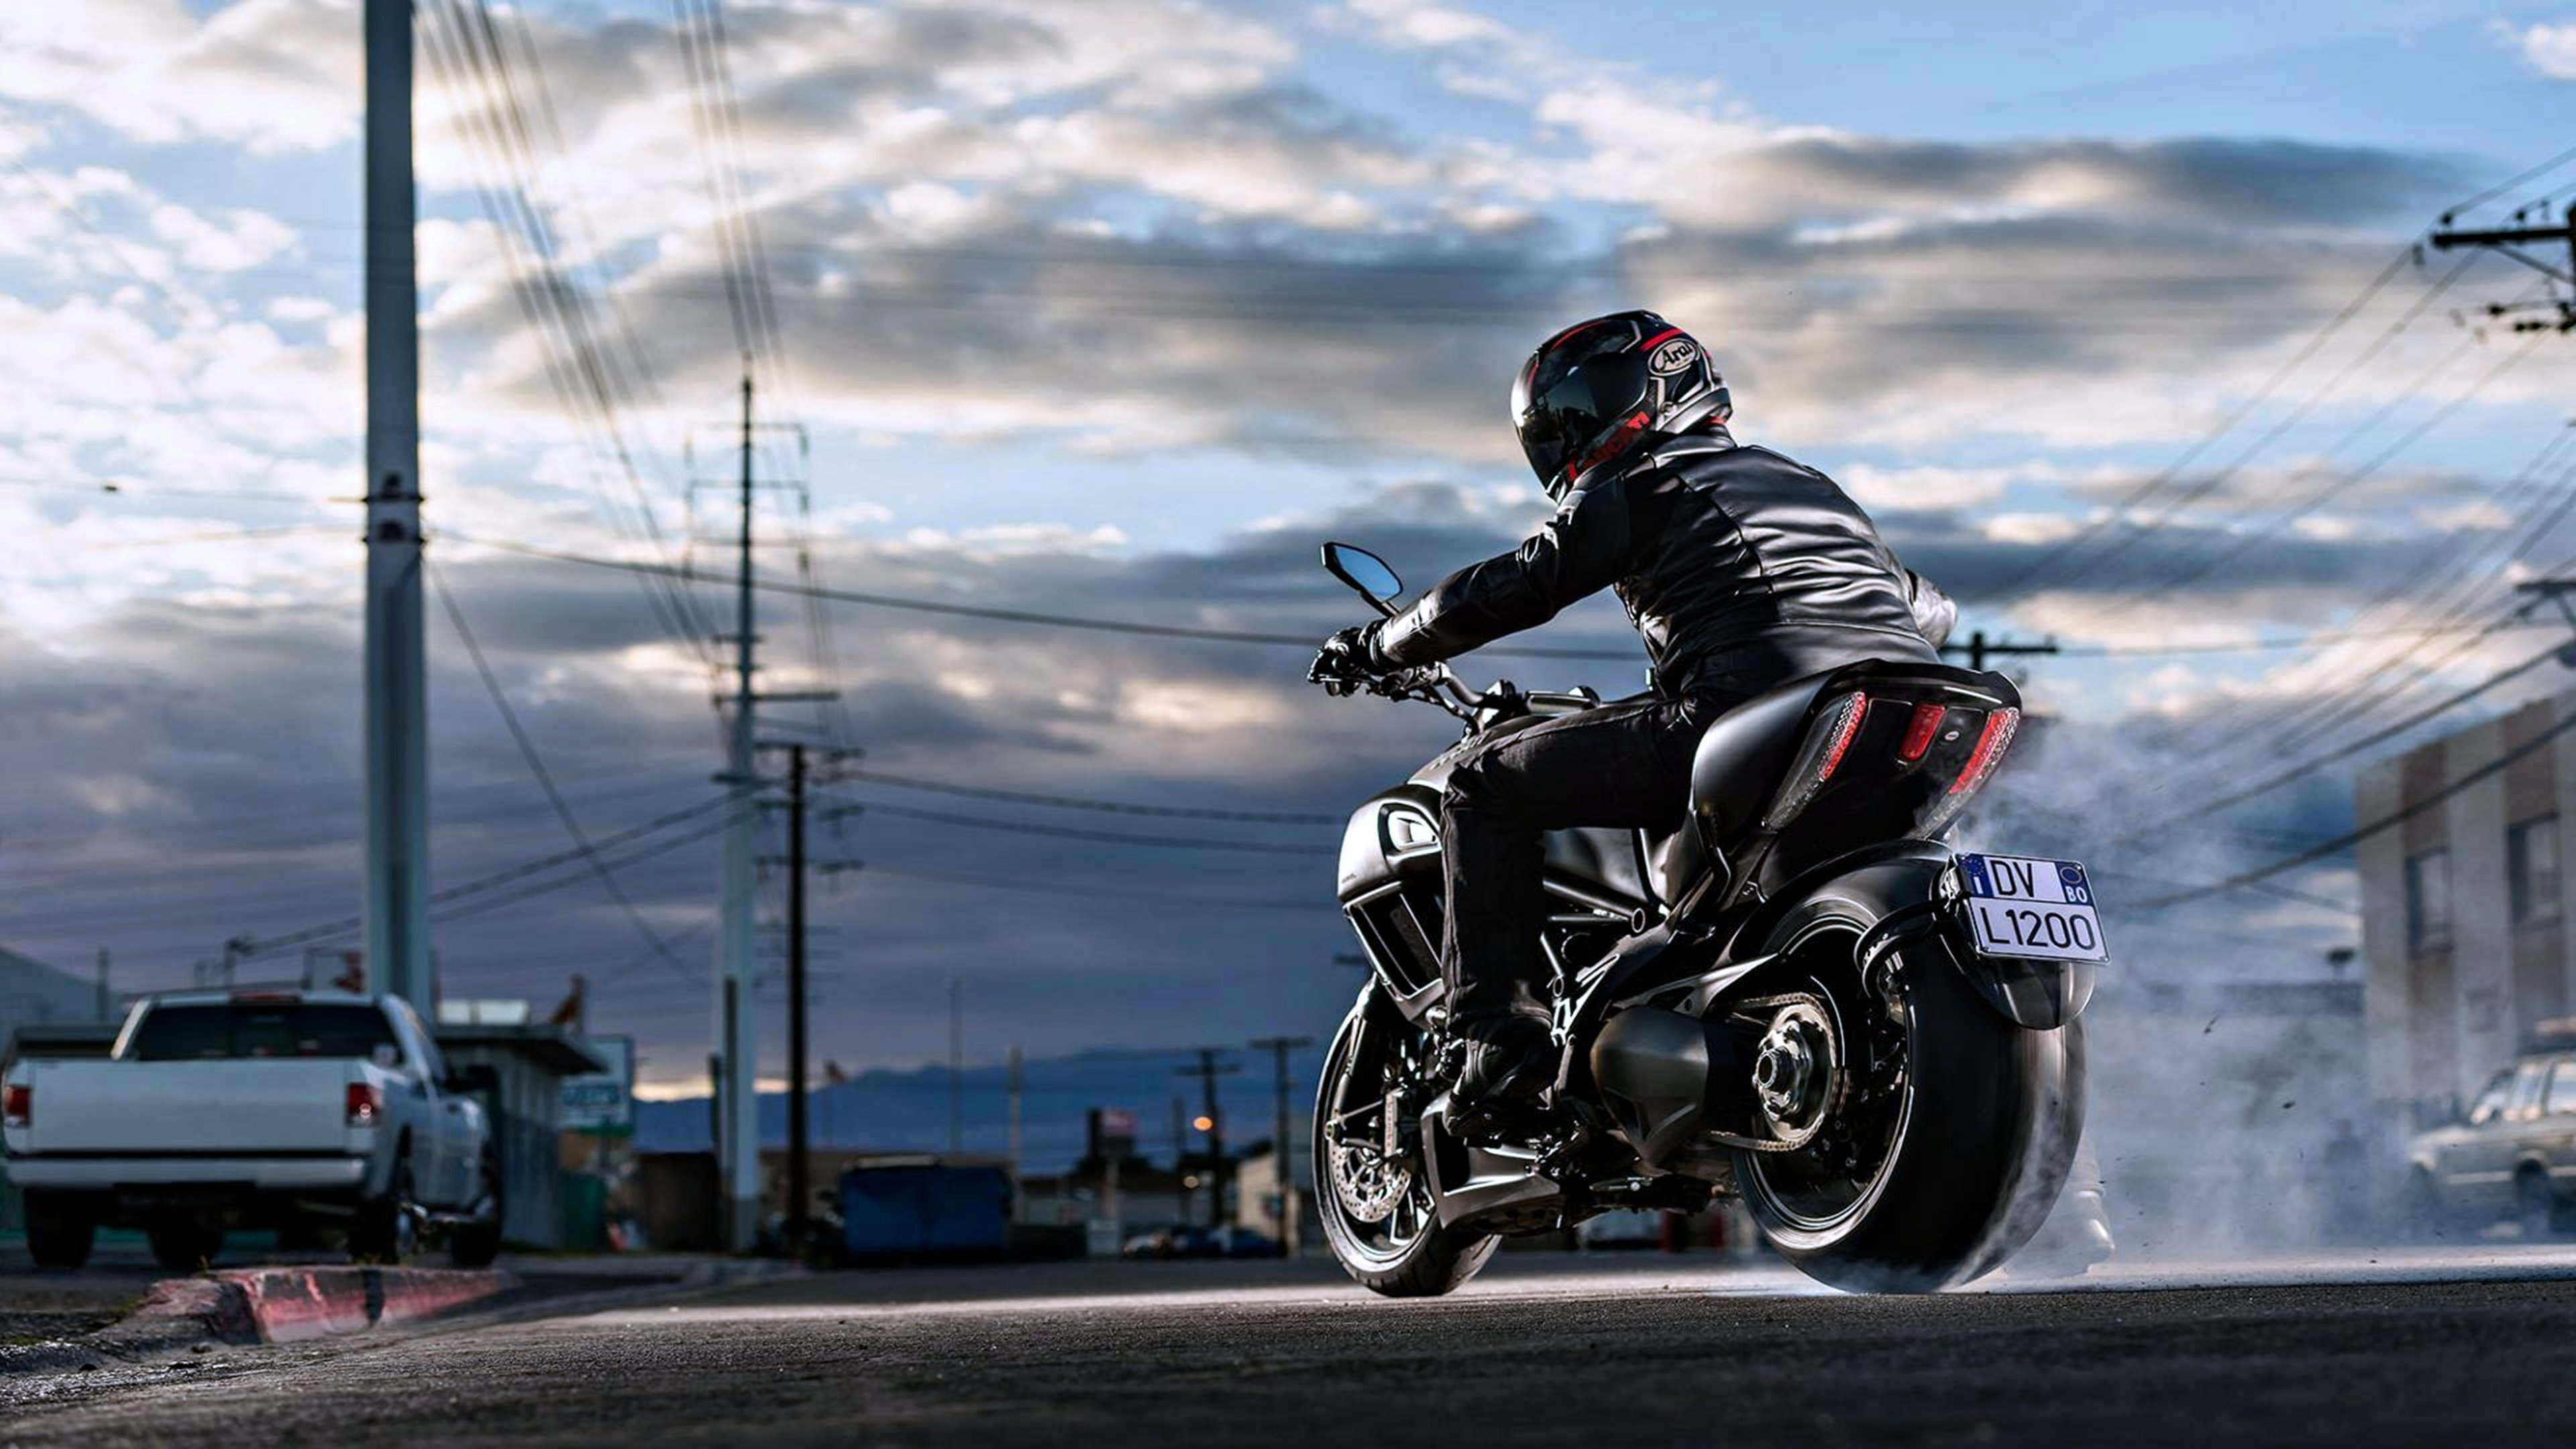 motorcycle motorcyclist road race cloud speed bike man ducati diavel